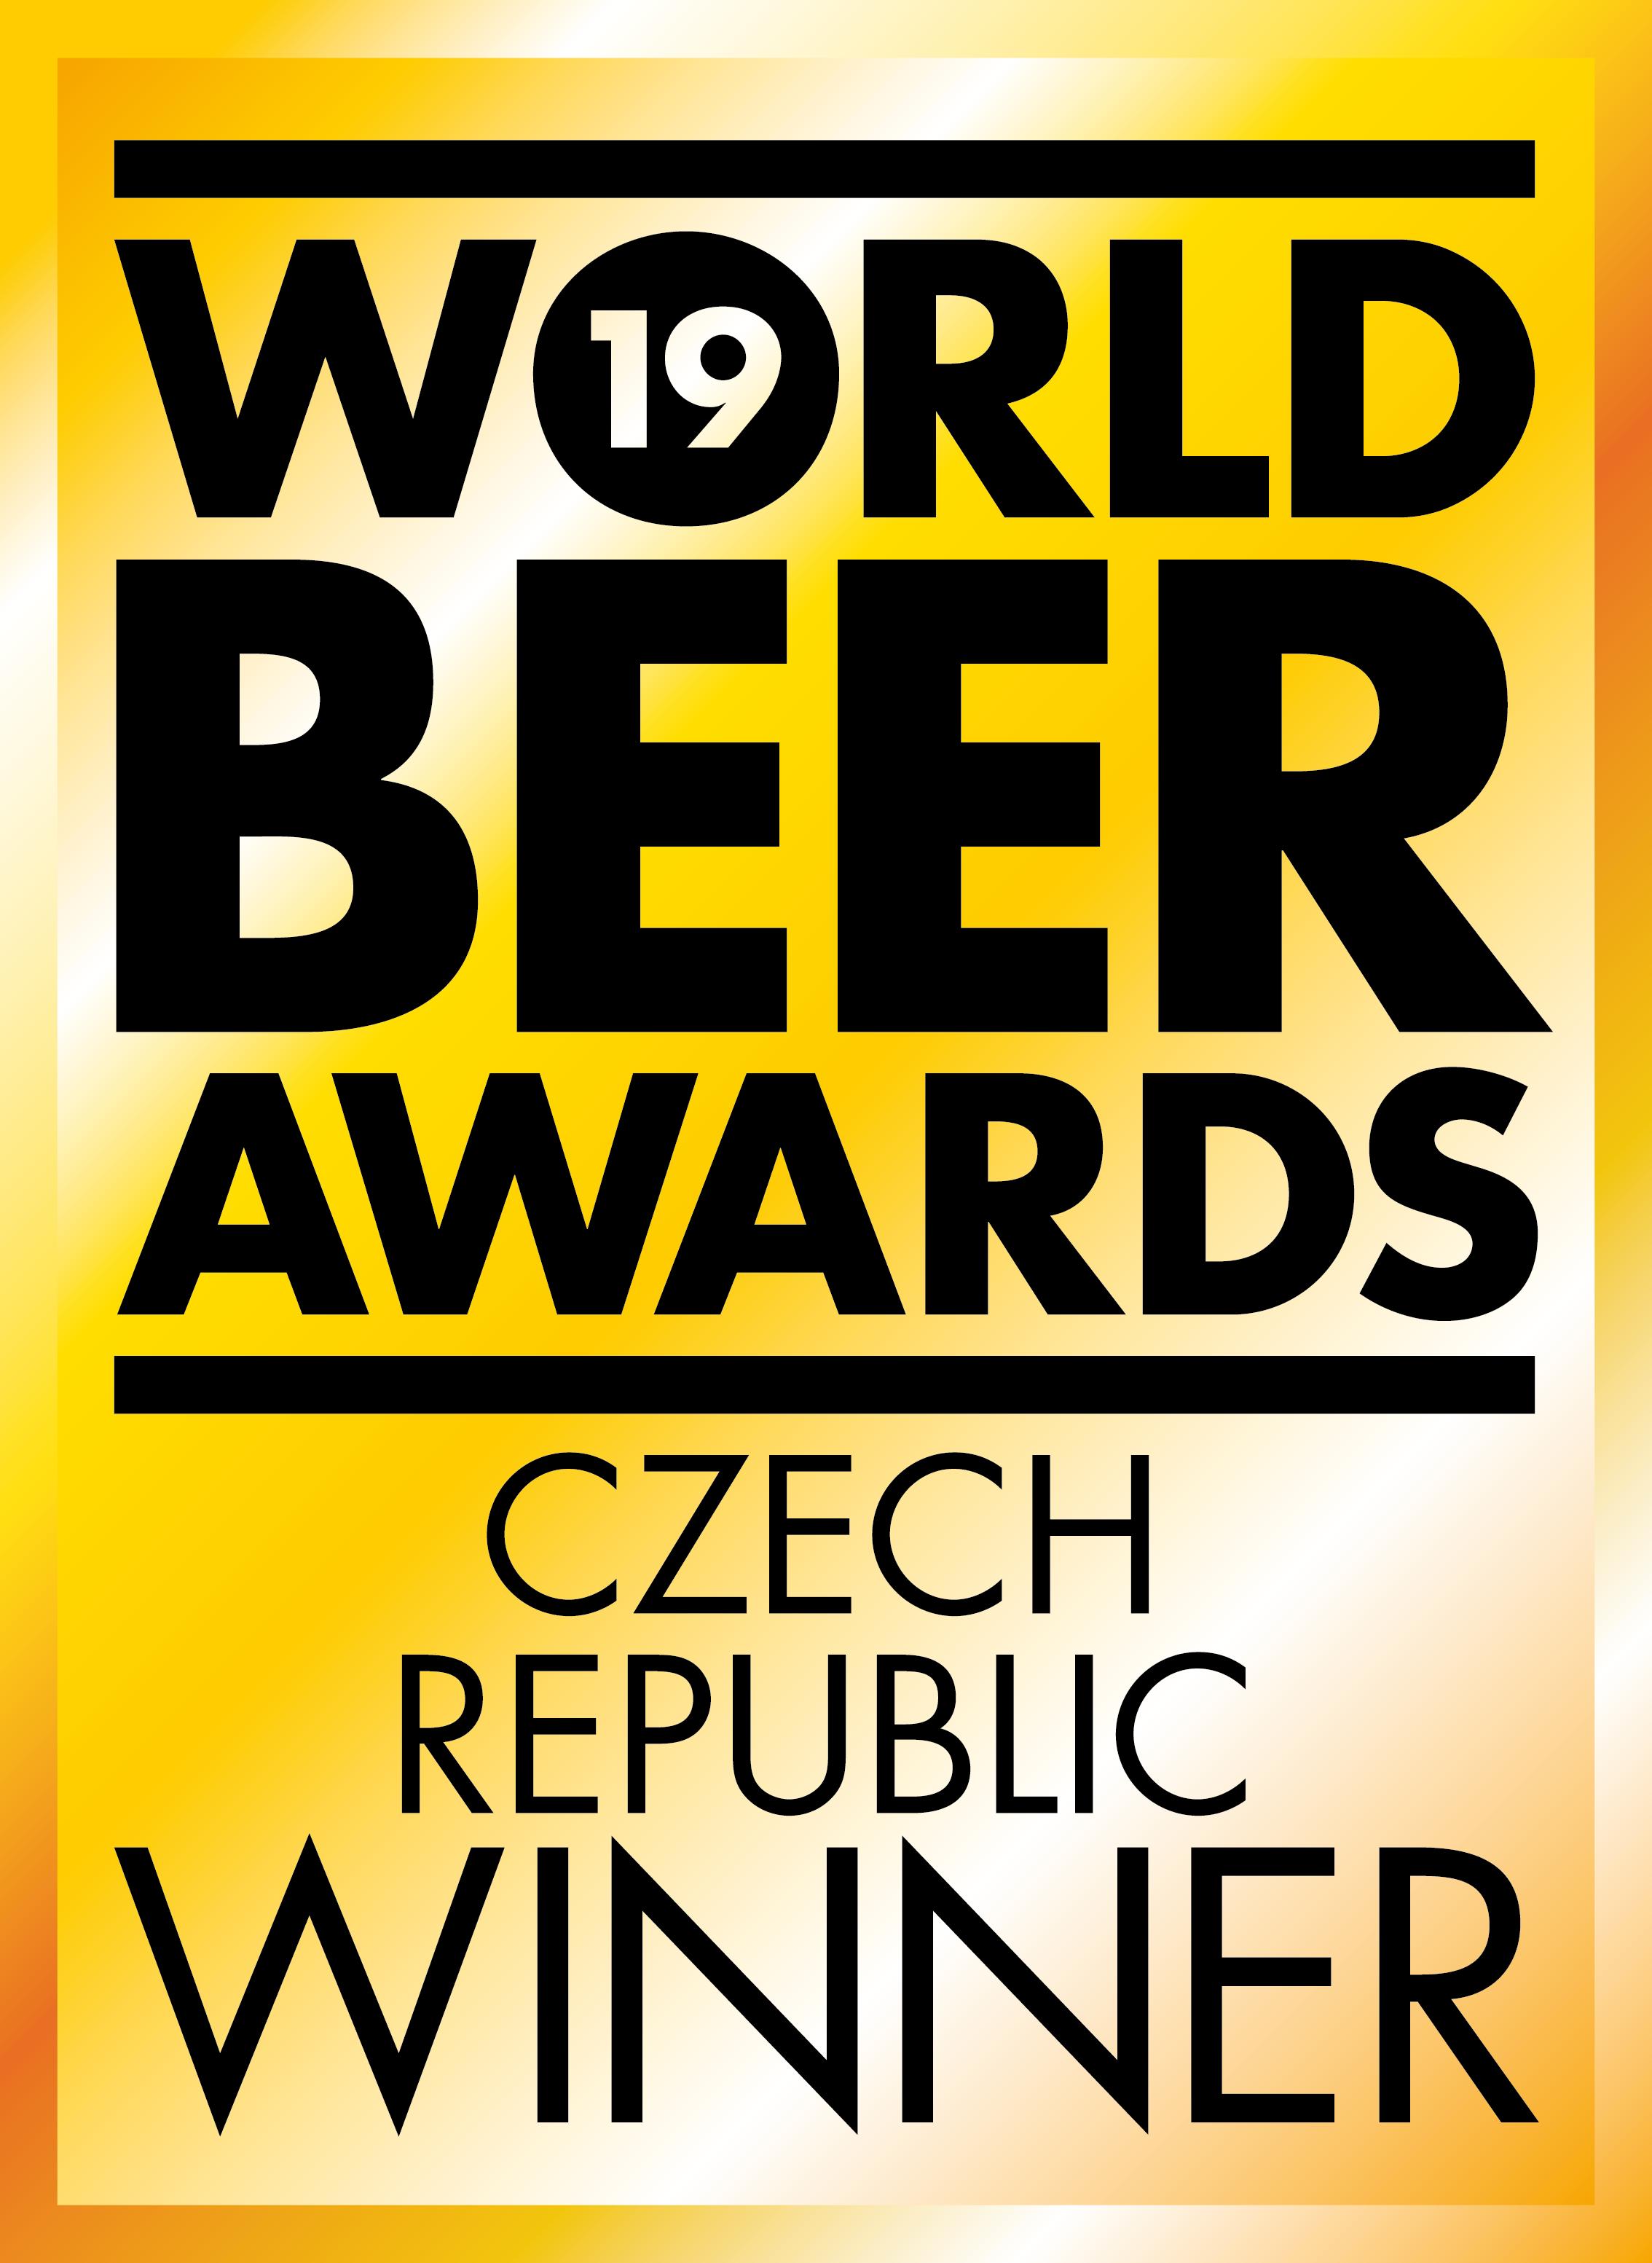 http://primator.cz/wp-content/uploads/2019/10/WBA19-CzechRepublic-WINNER.png